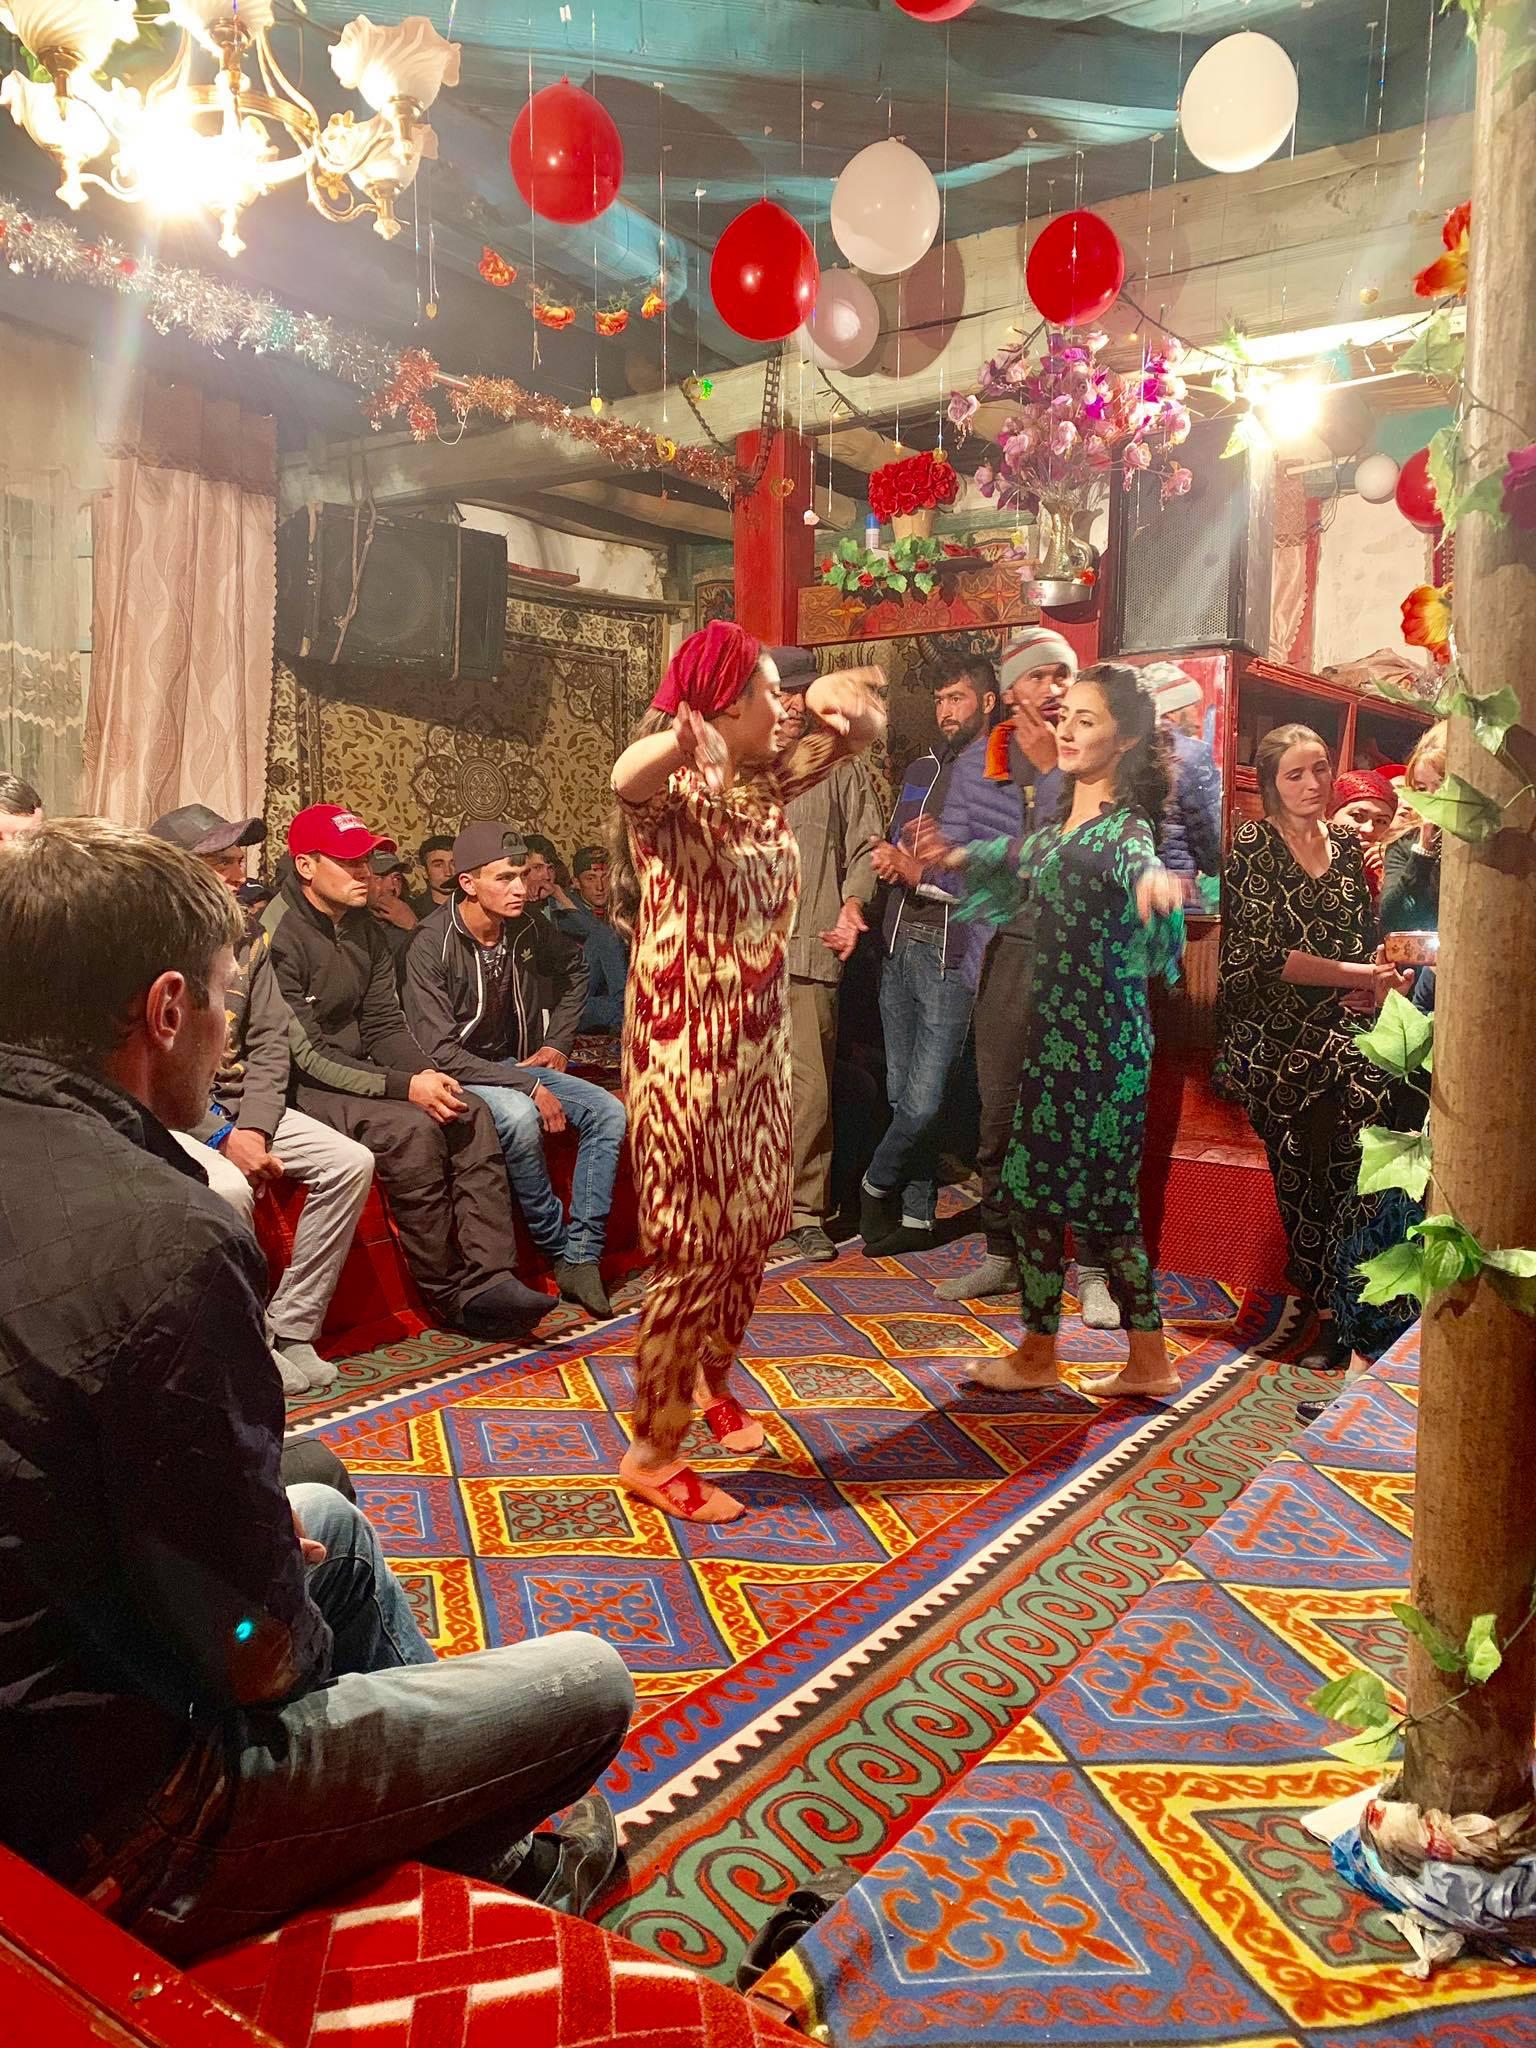 Kach Solo Travels in 2019 Experiencing a Traditional Wakhan Wedding in Tajikistan1.jpg